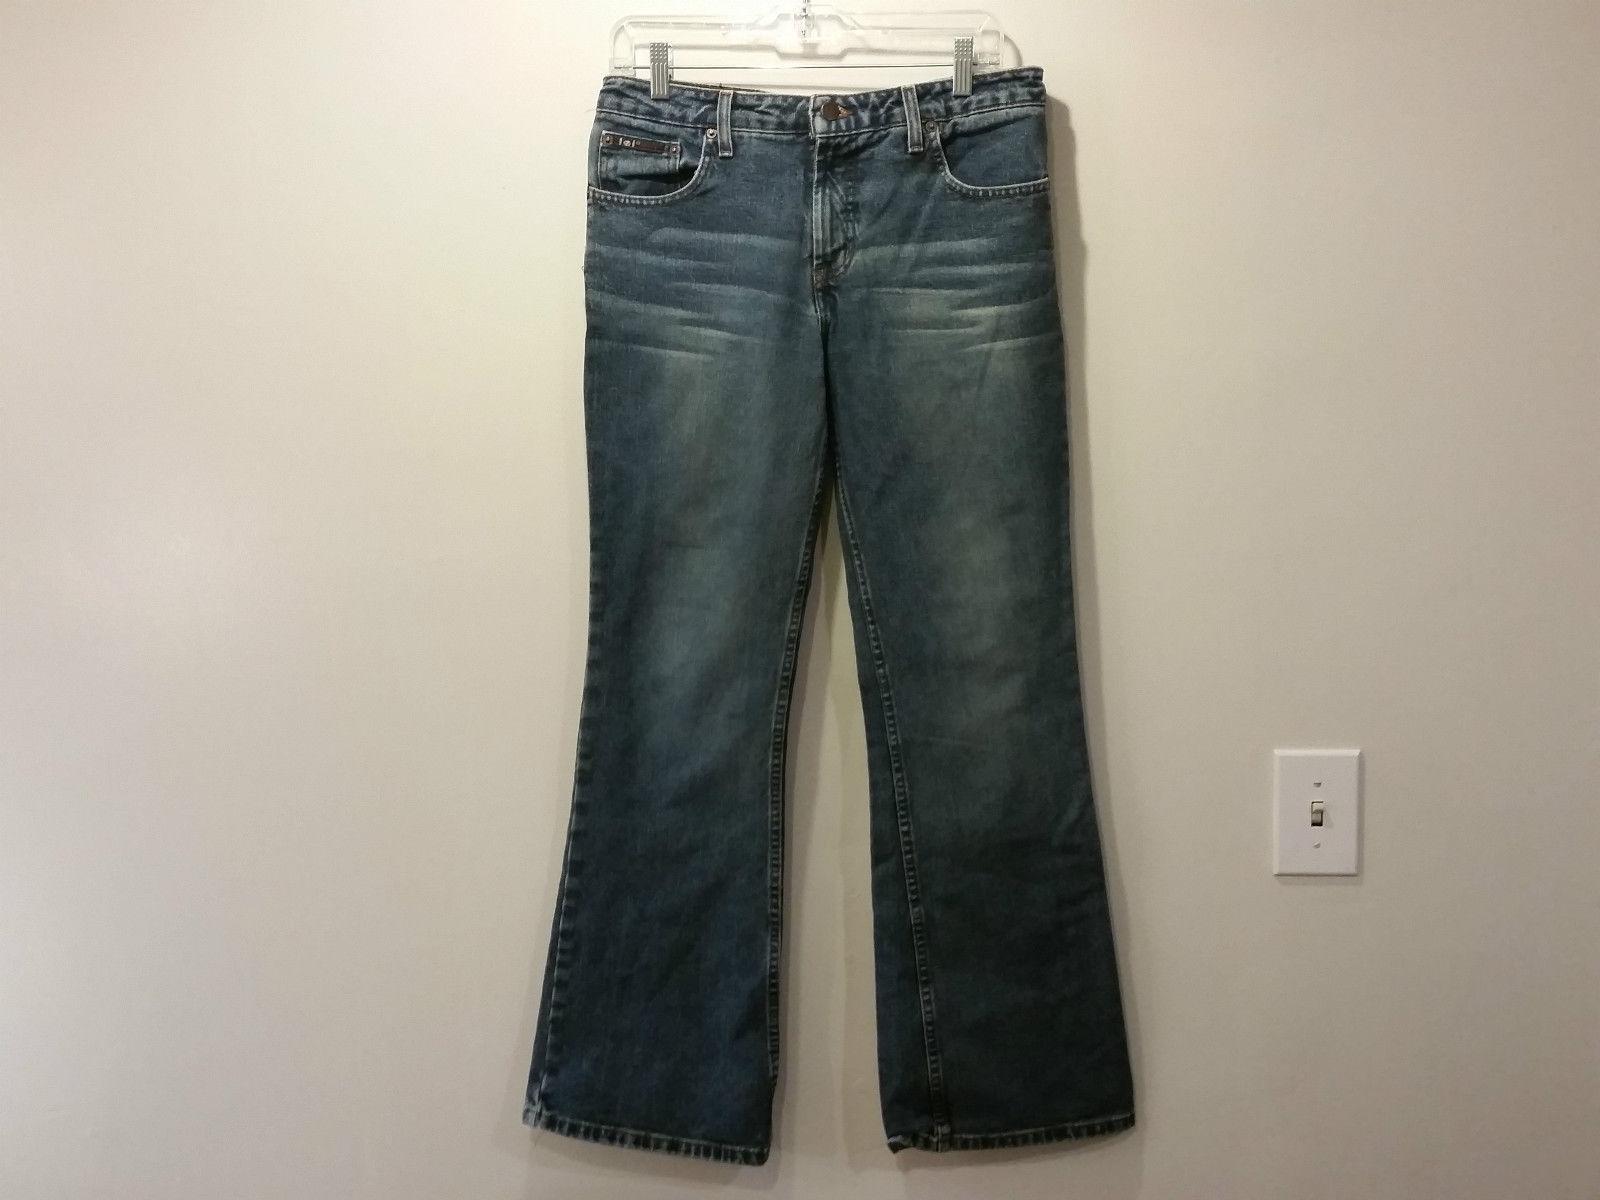 LEI Life Energy Intelligence Blue Jeans 100 Percent Cotton Size 11